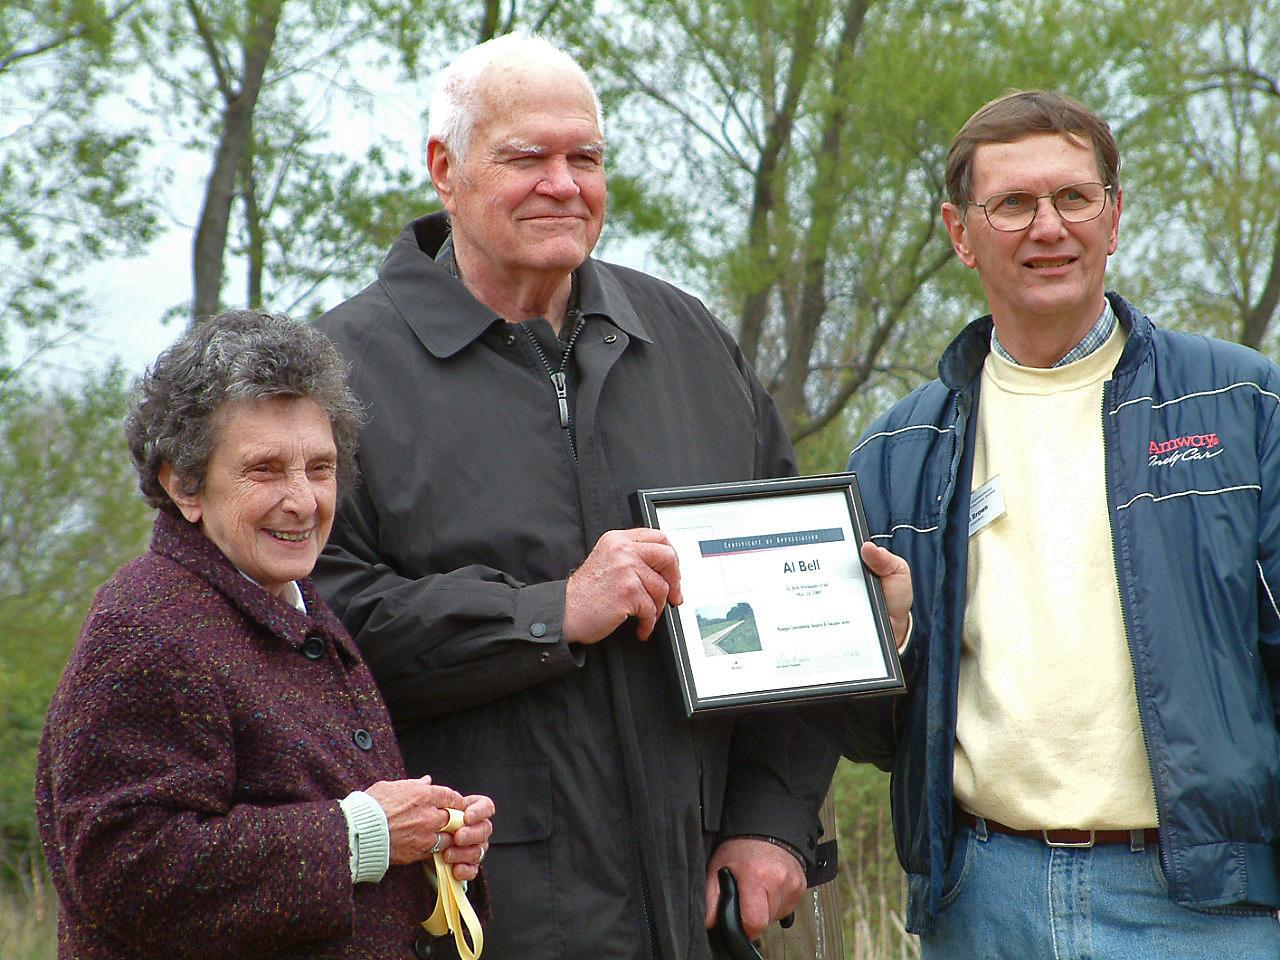 Al Bell receiving award